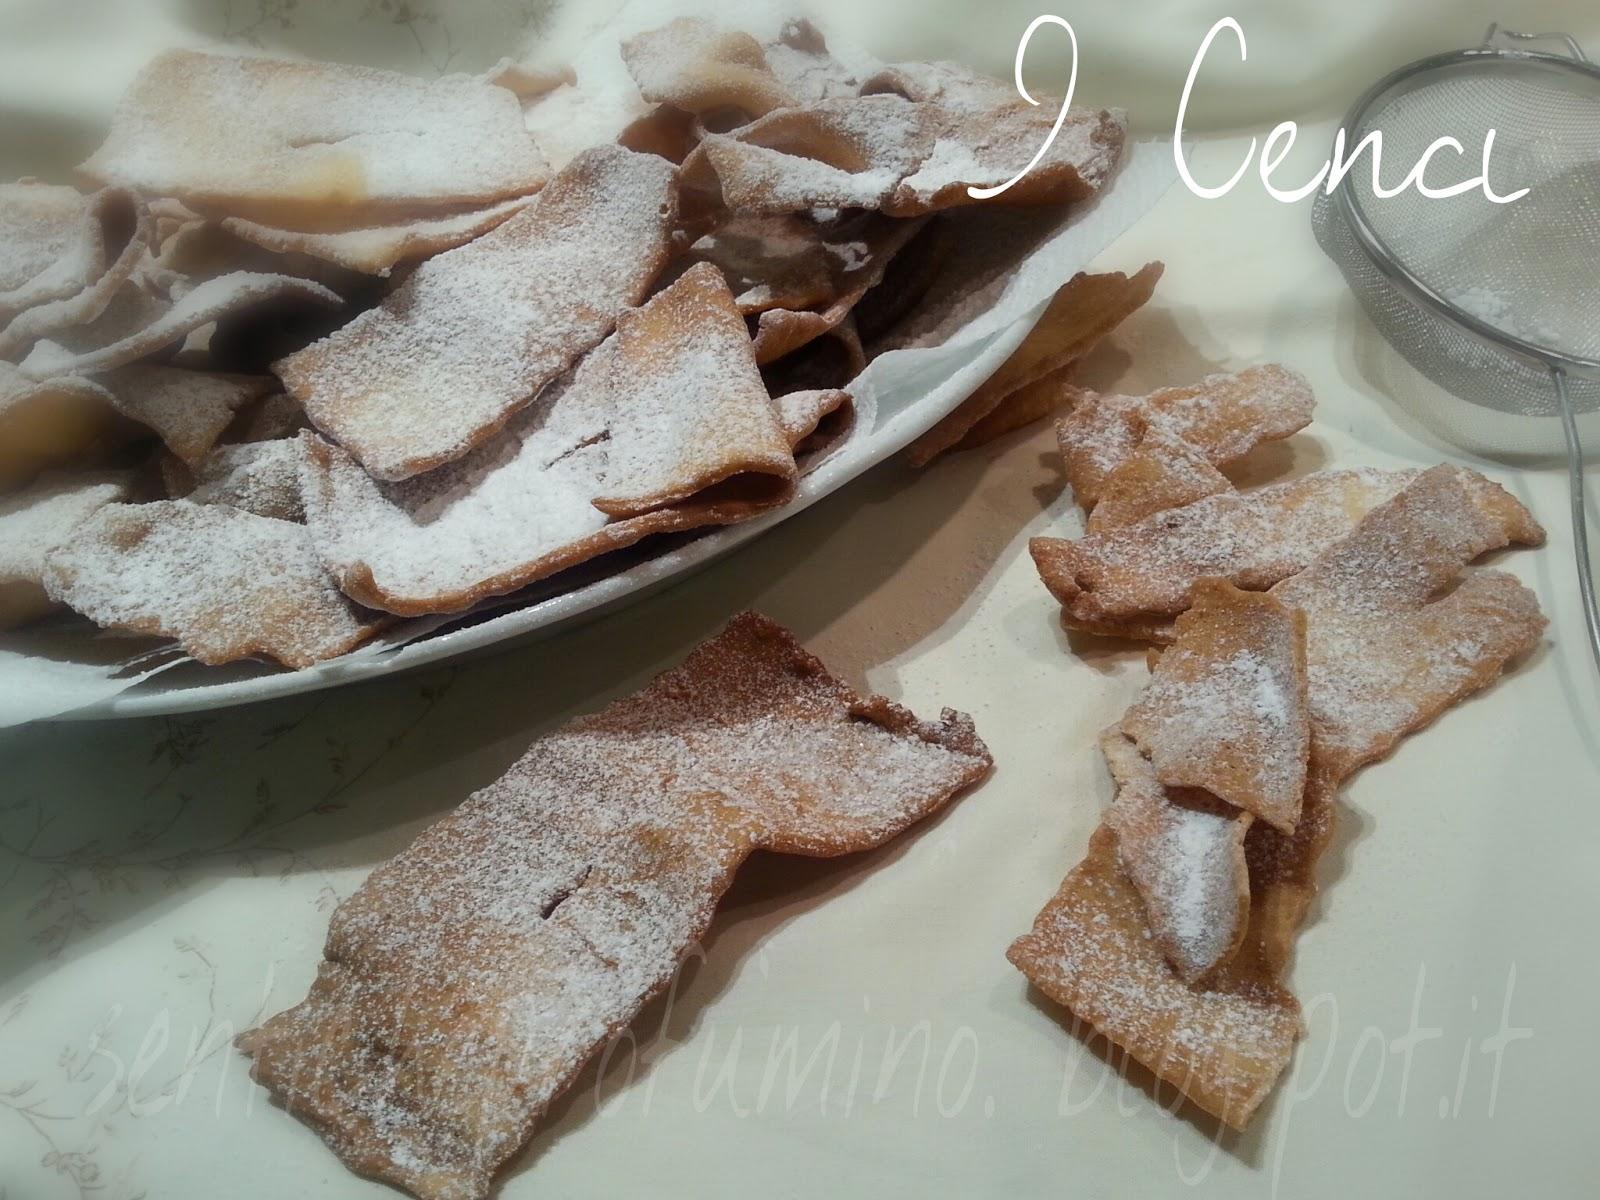 I Cenci, ricetta tradizionale di cucina toscana, chiacchere o frappe